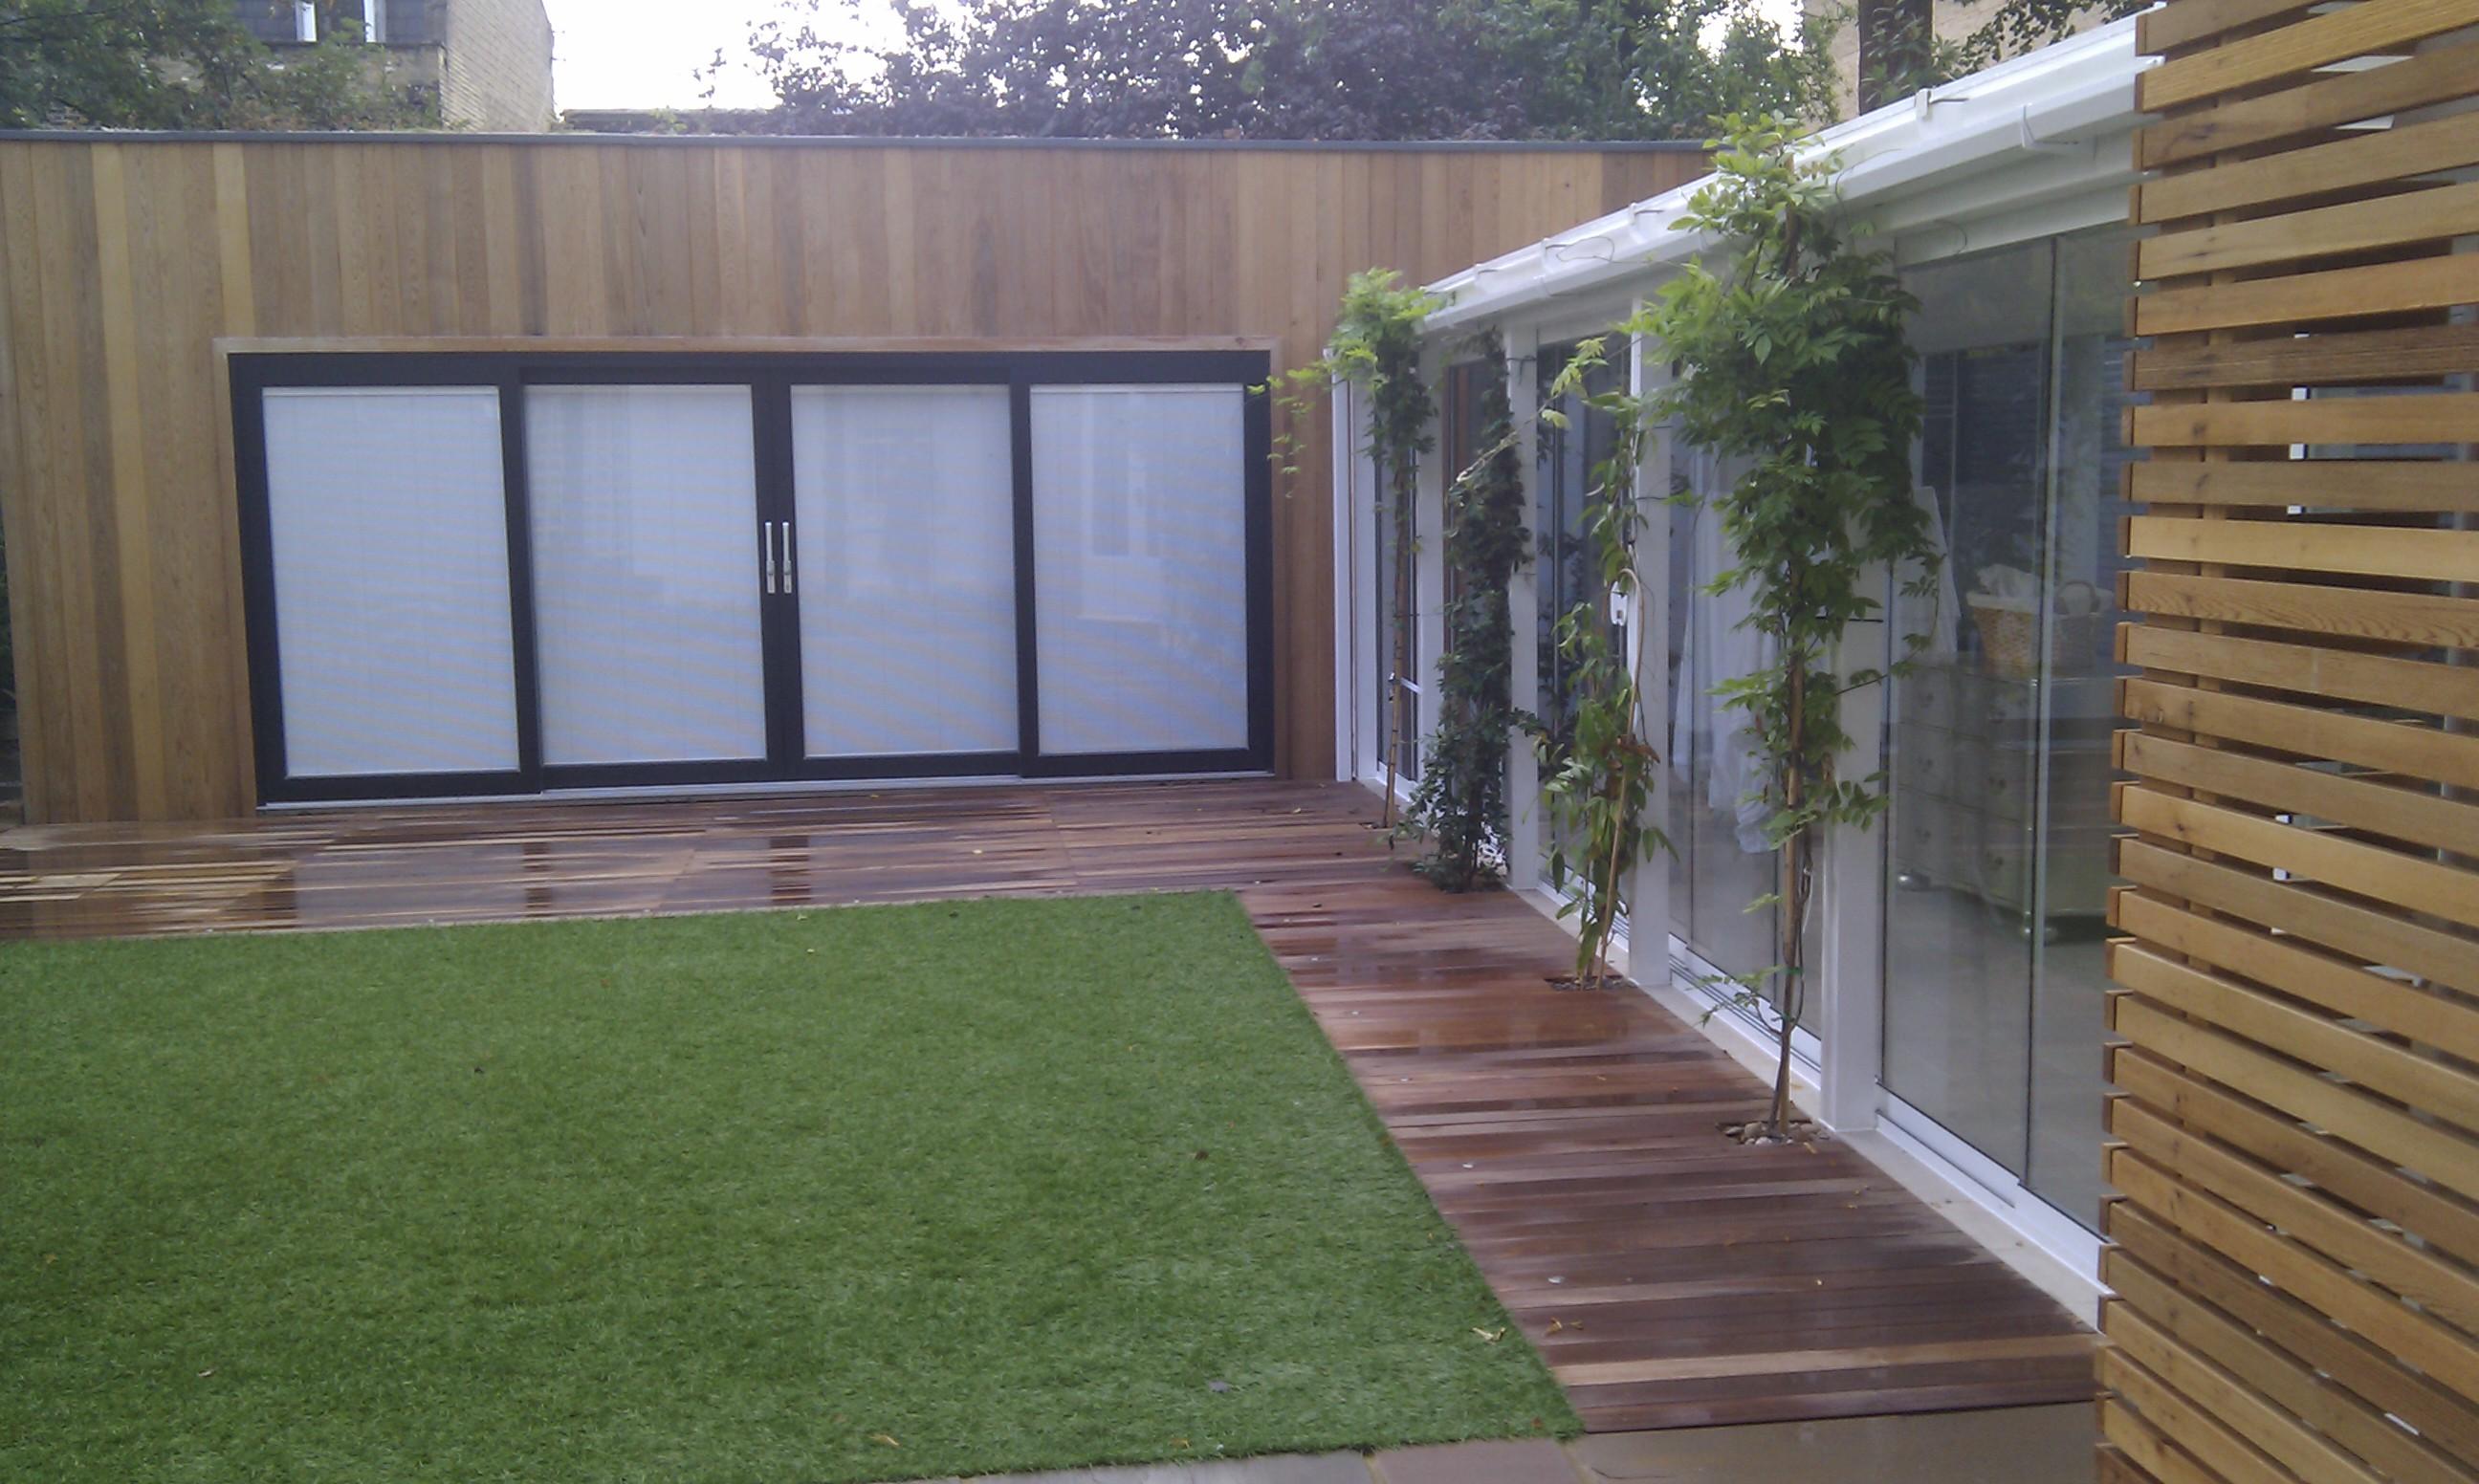 modern garden design london slatted grey privacy screen sandstone paving easy grass balau hardwood decking (25)